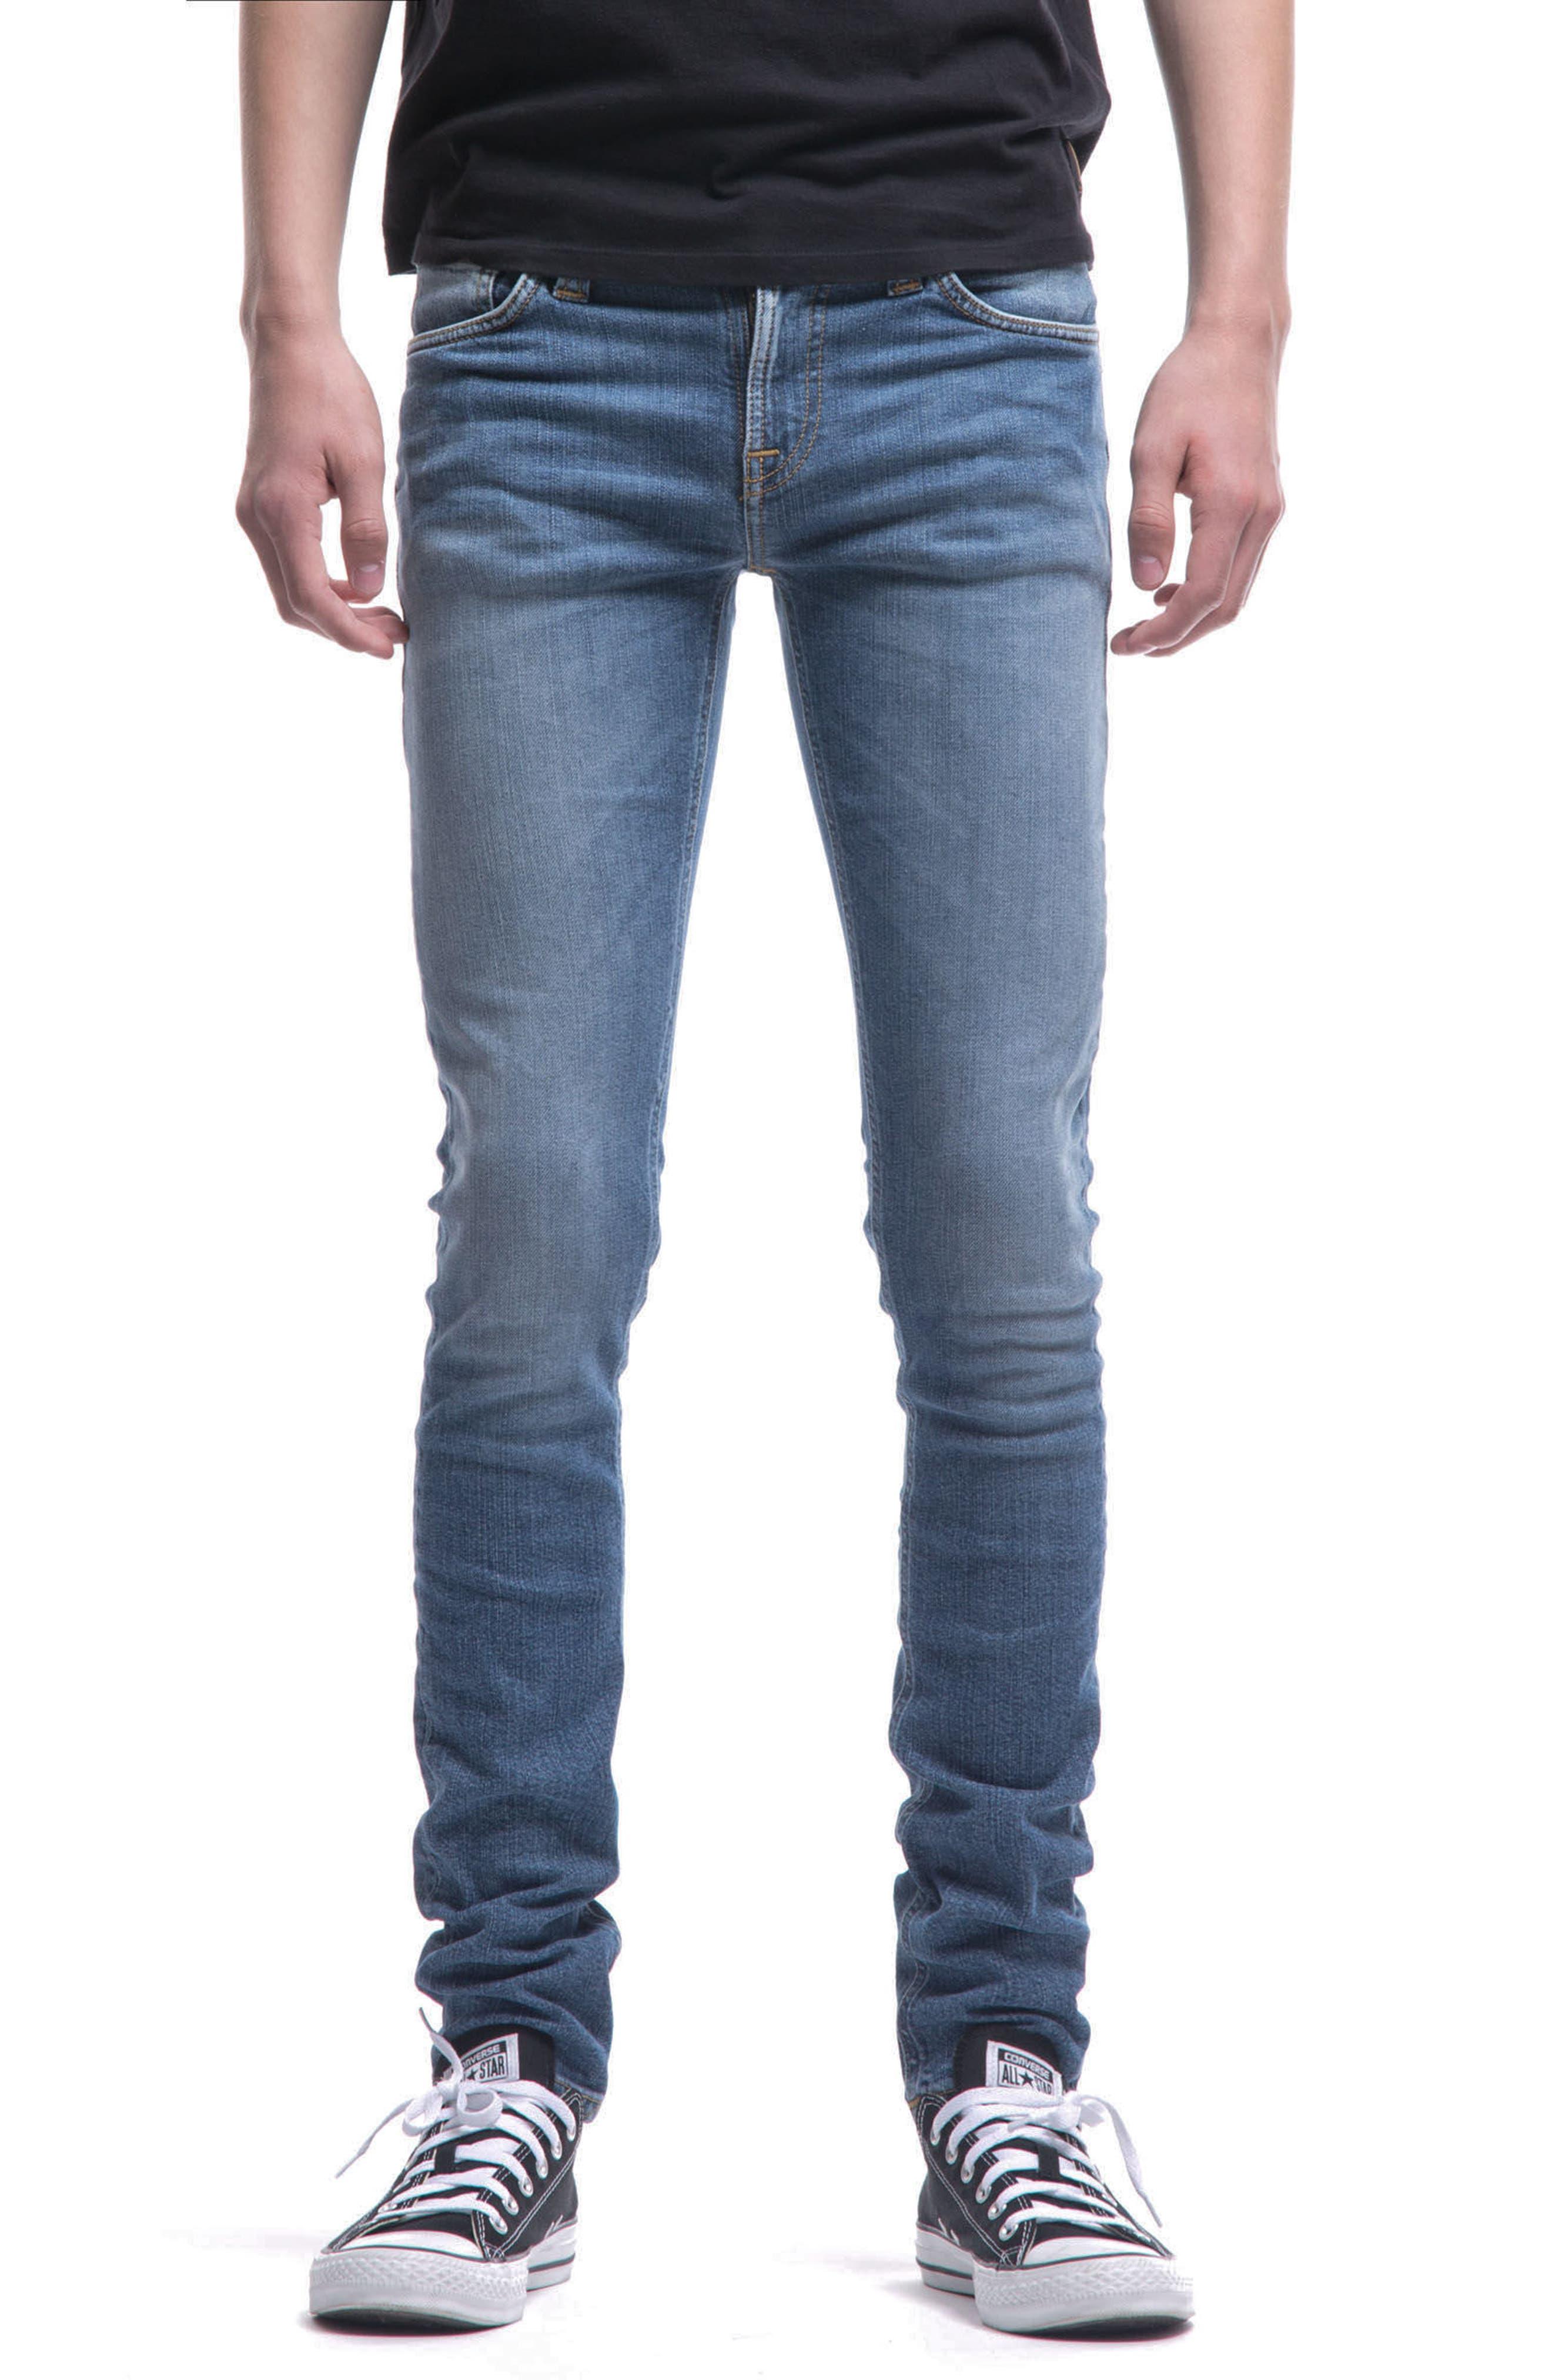 Skinny Lin Skinny Fit Jeans,                         Main,                         color, 460